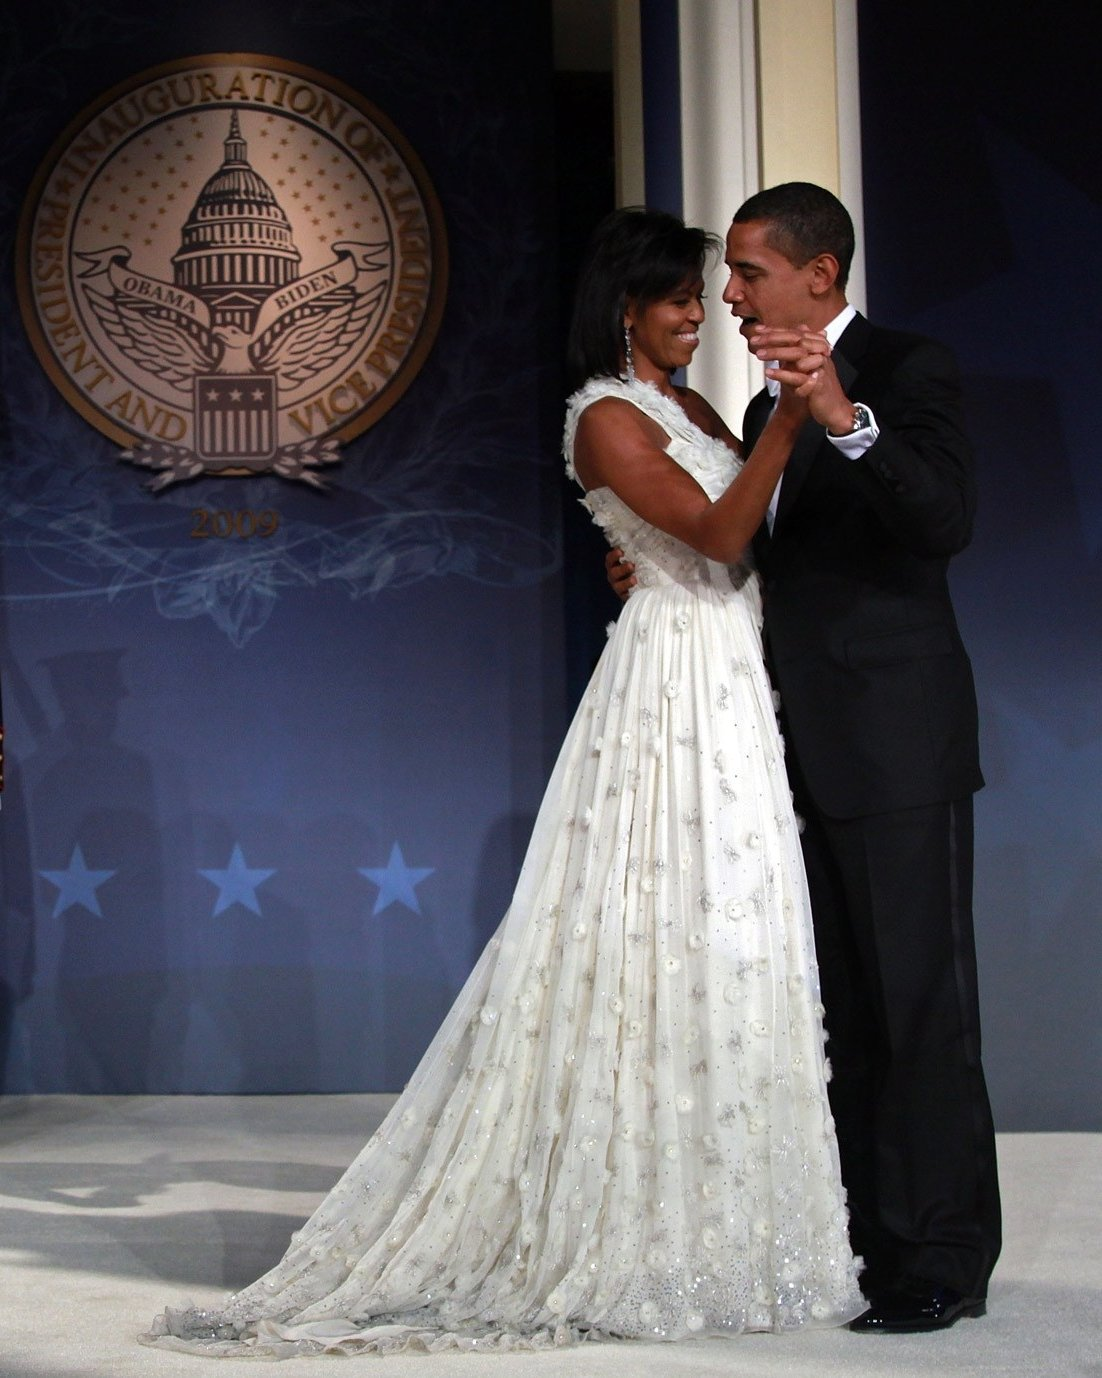 Barack & Michelle Obama 8 x 10/8x10 GLOSSY Photo Picture IMAGE #2